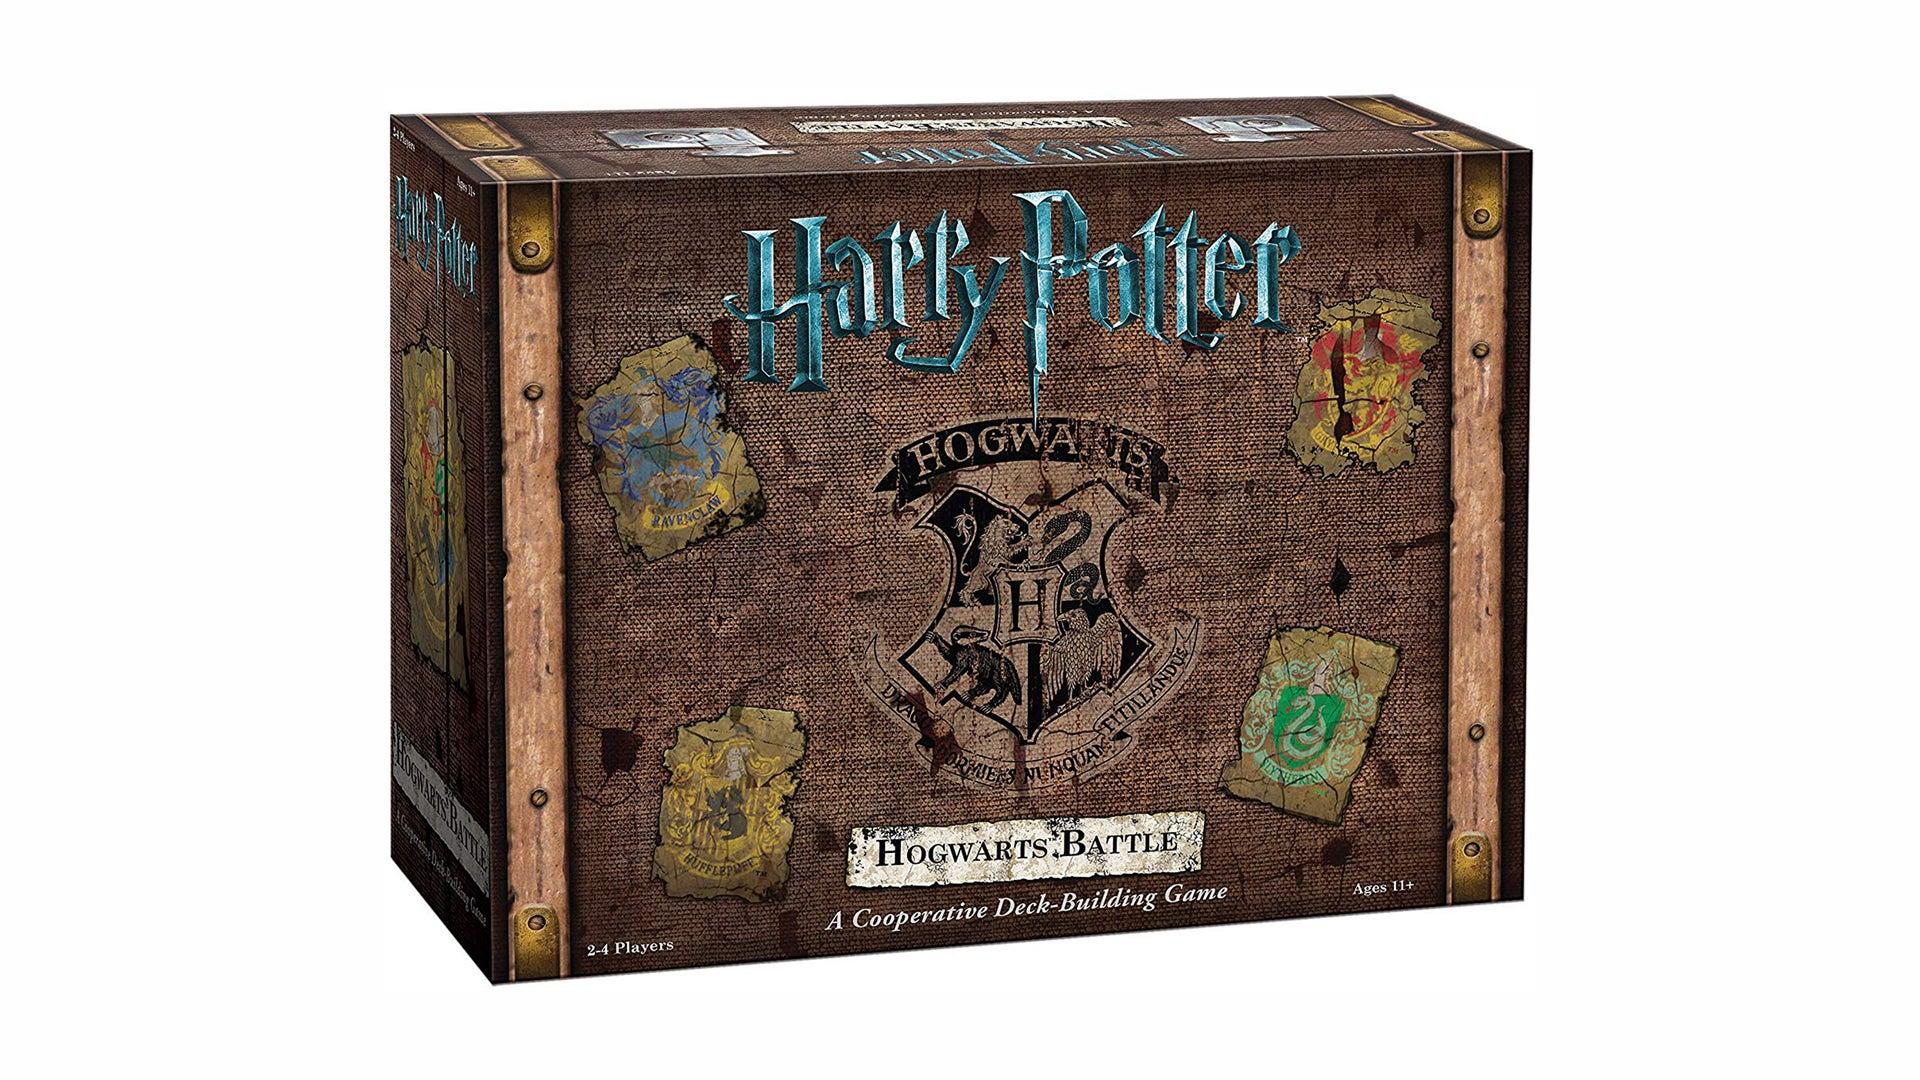 Harry Potter: Hogwarts Battle box